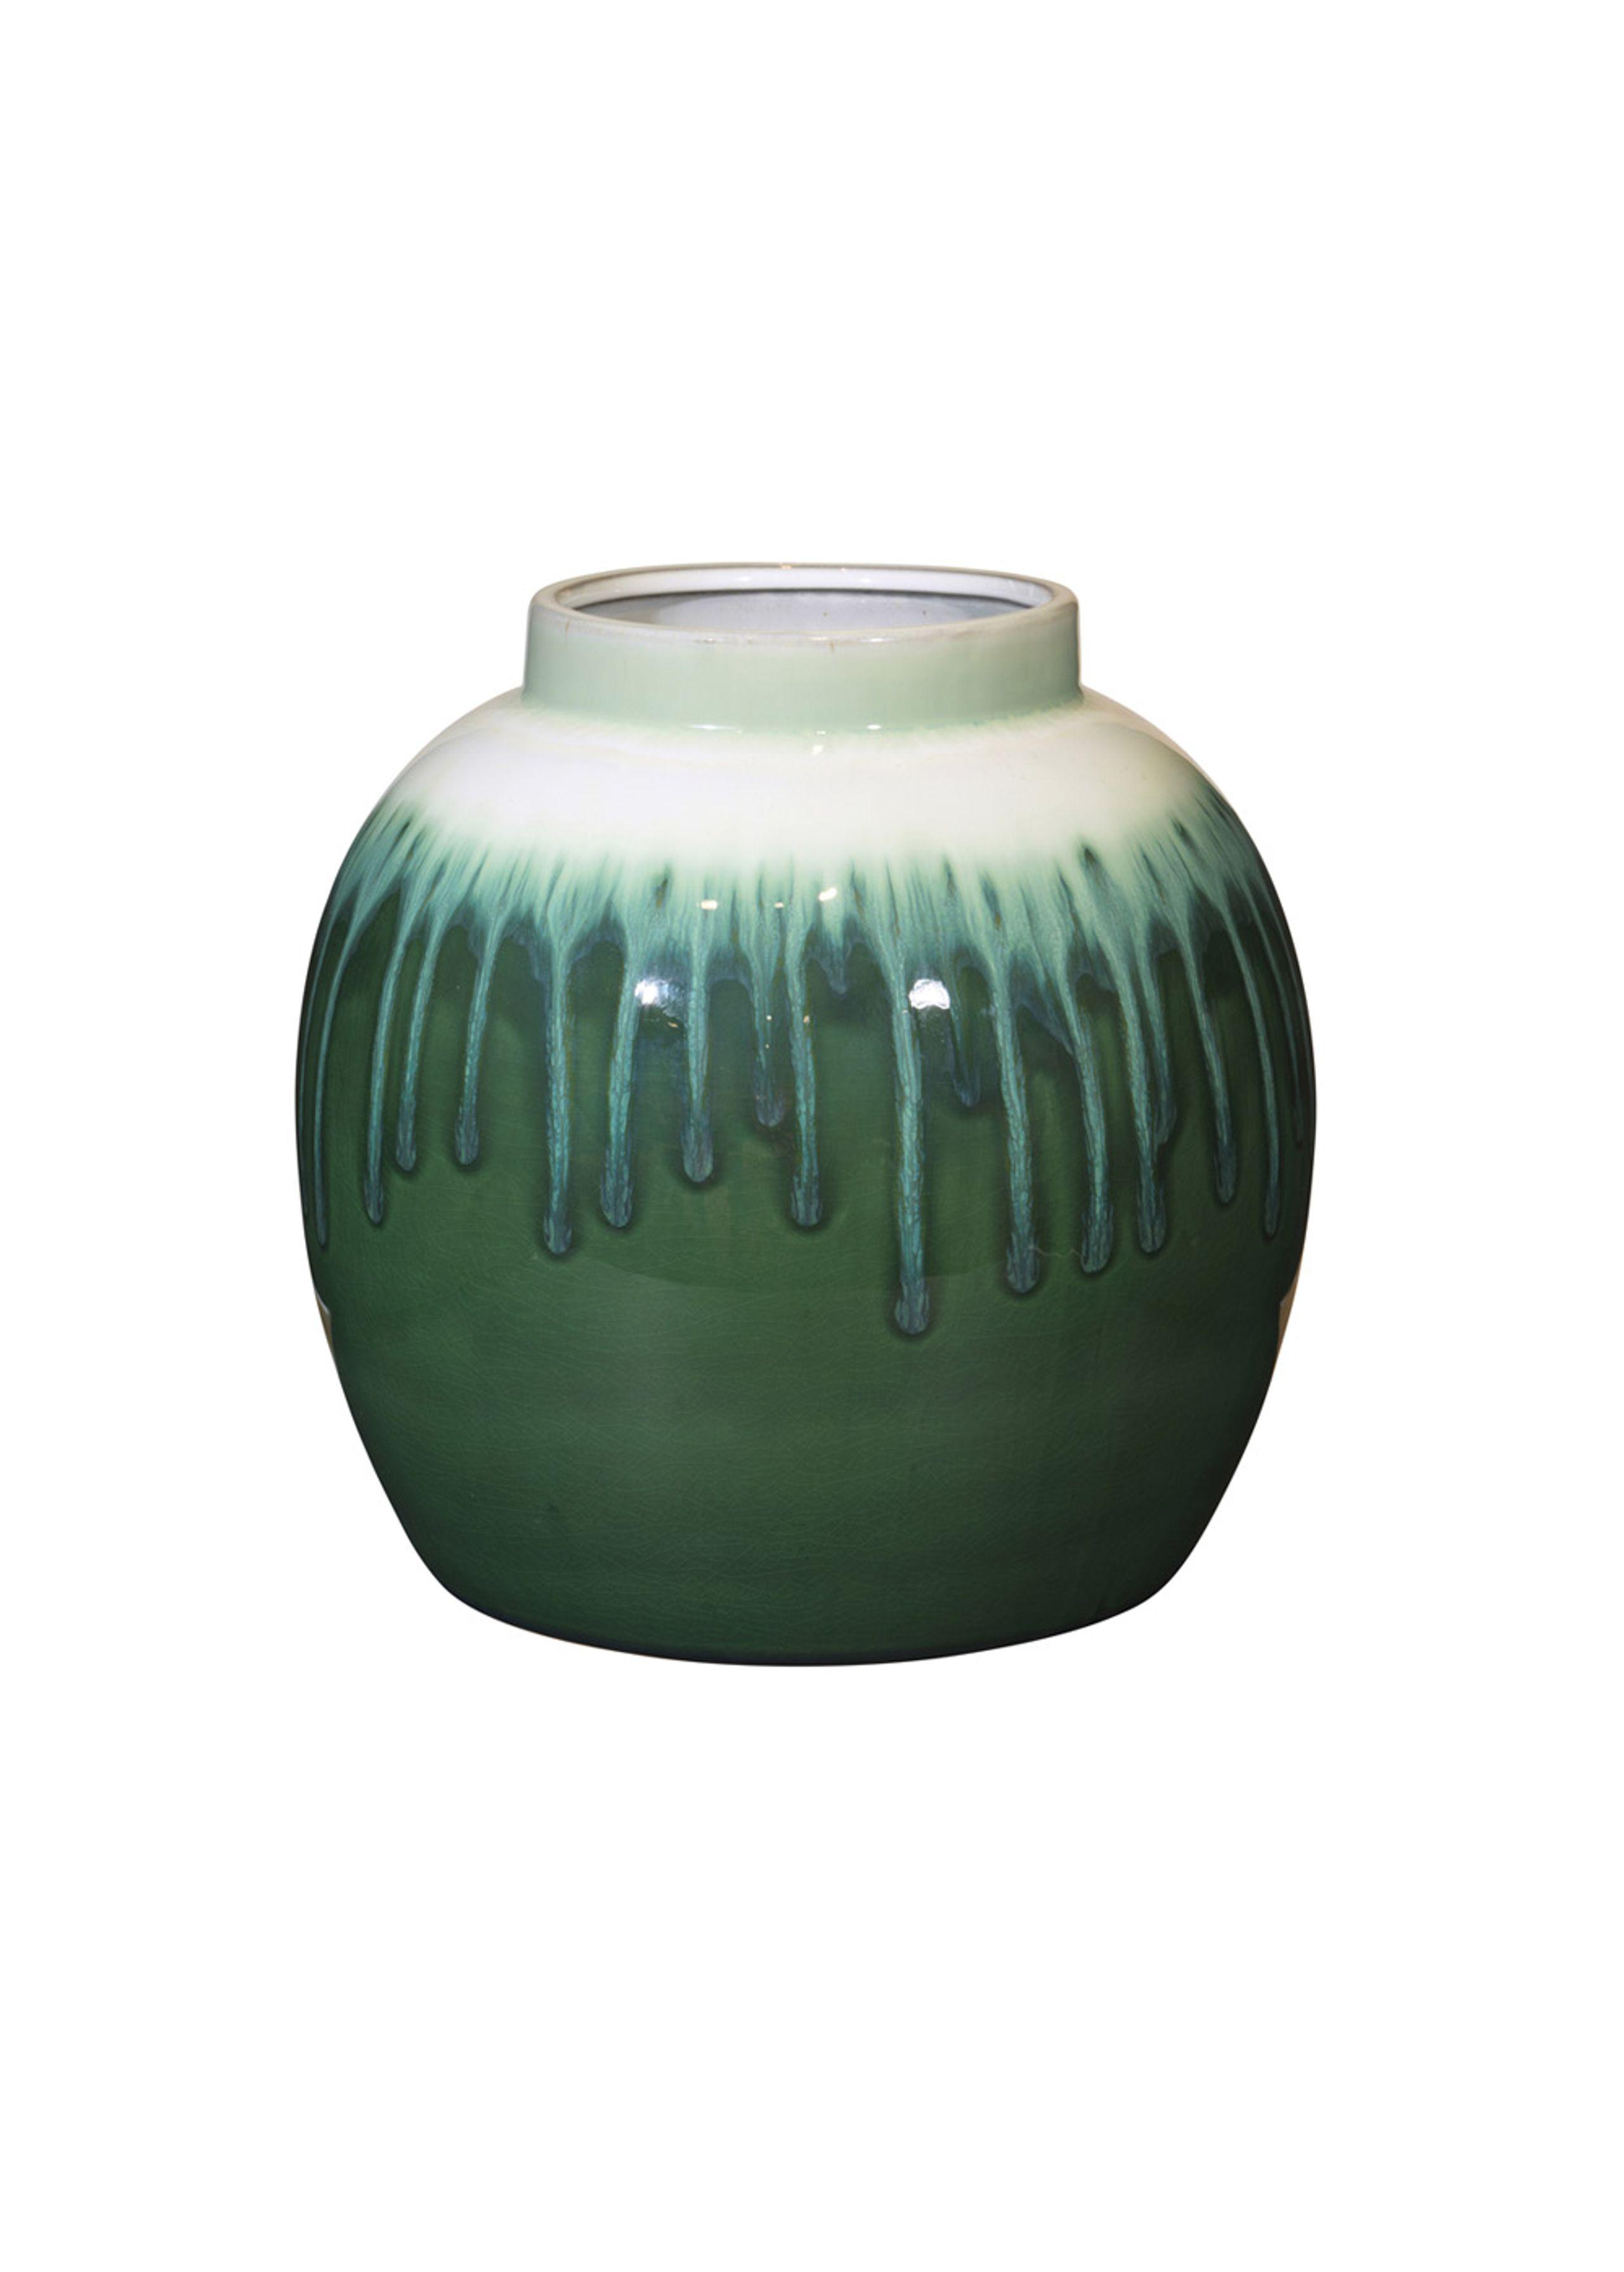 Rune vase